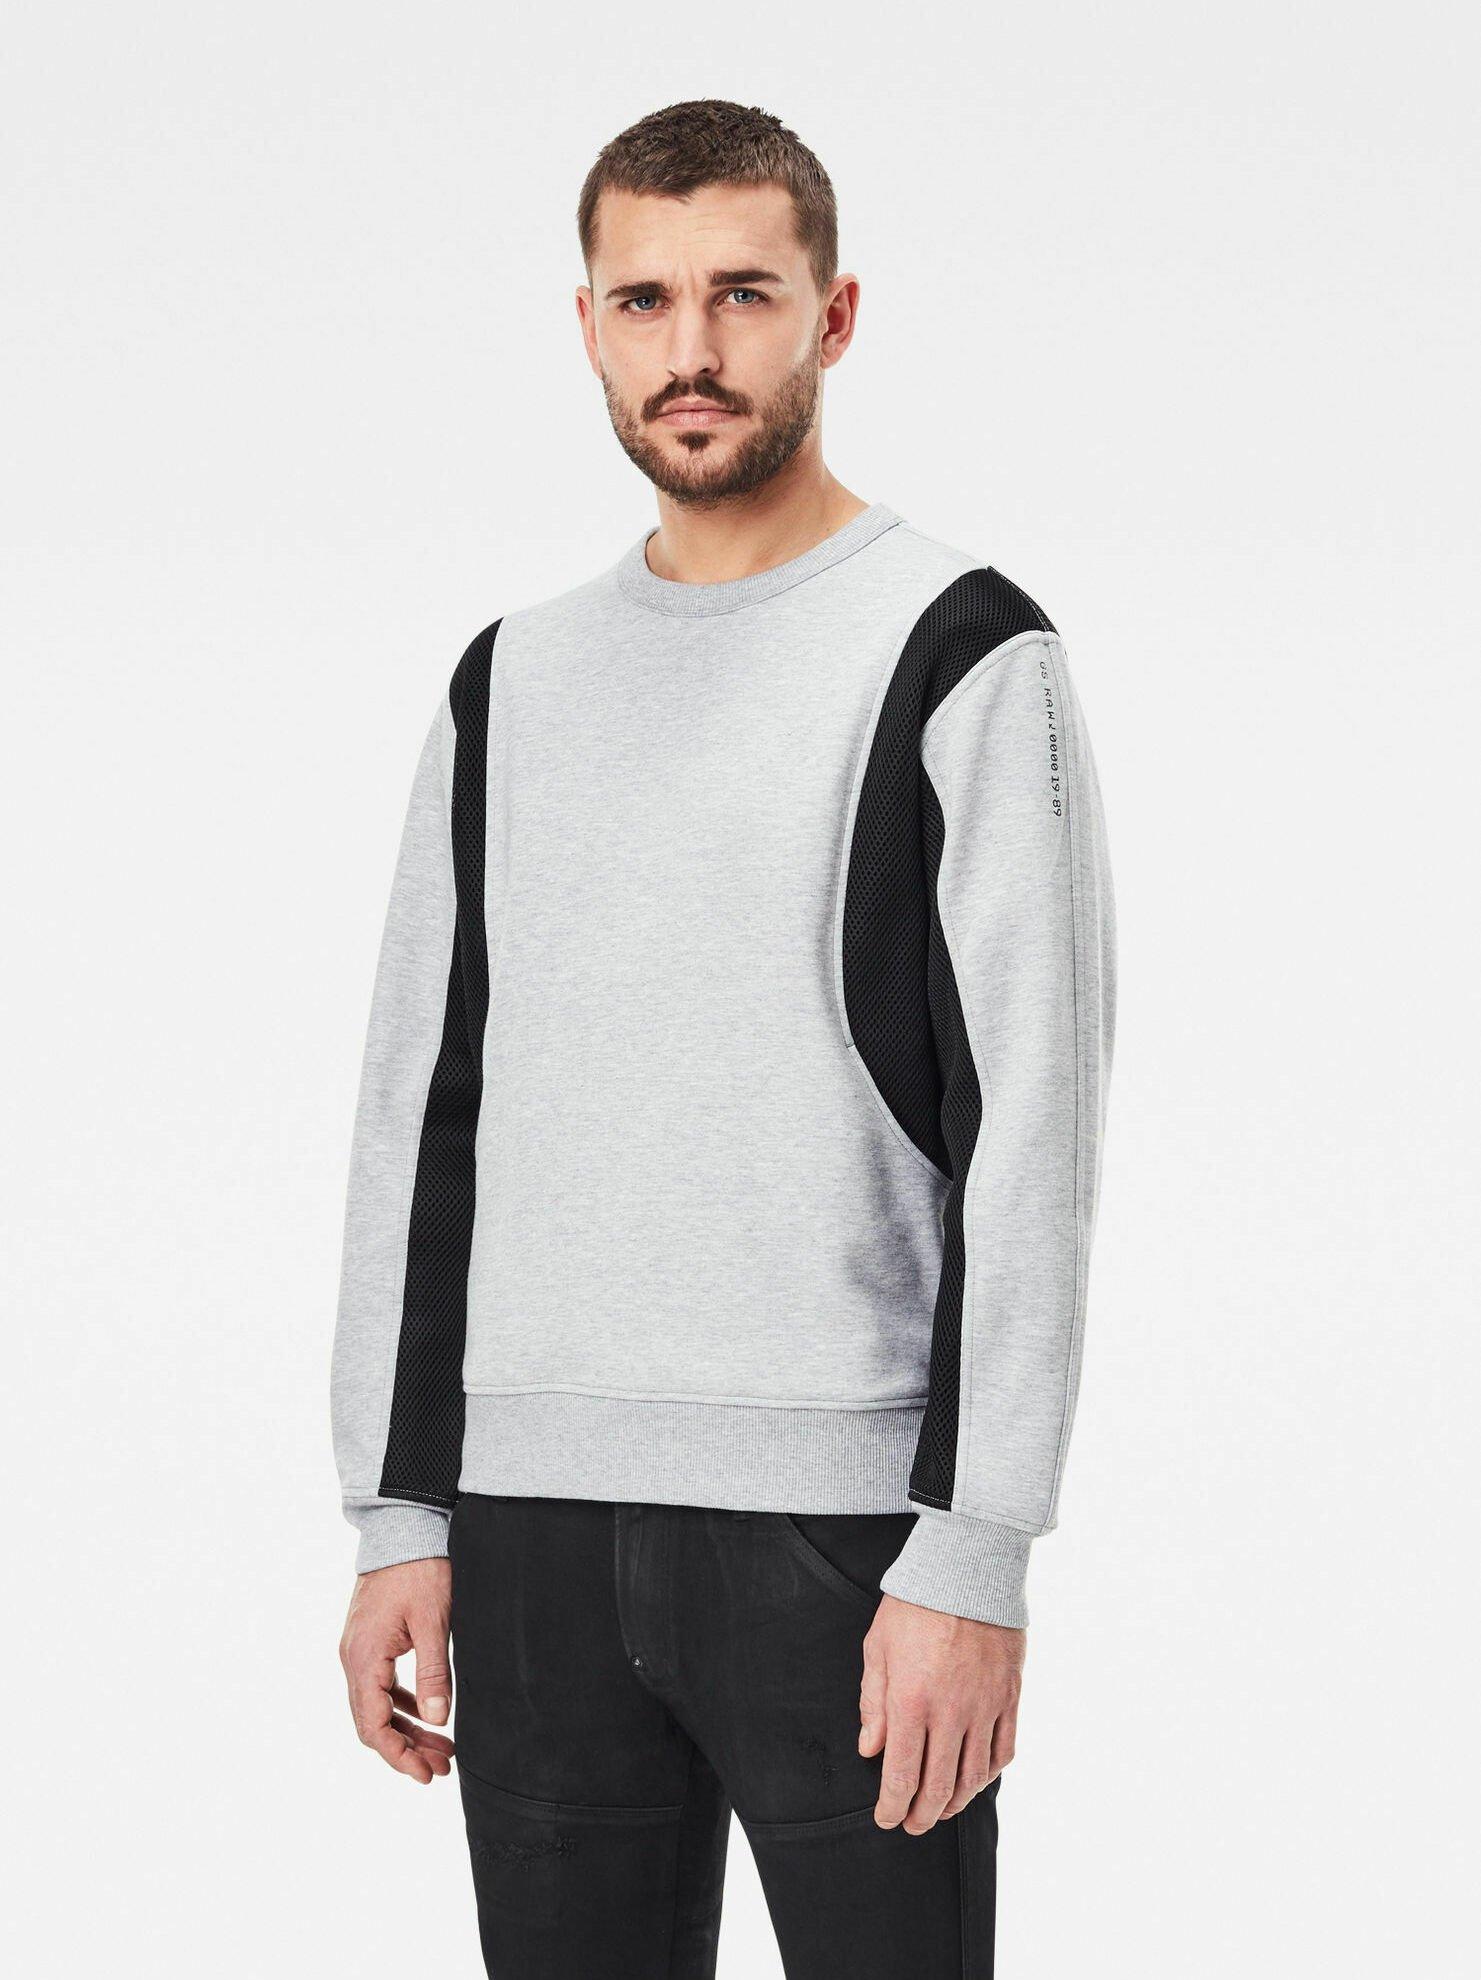 Homme MOTO MESH ROUND LONG SLEEVE - Sweatshirt